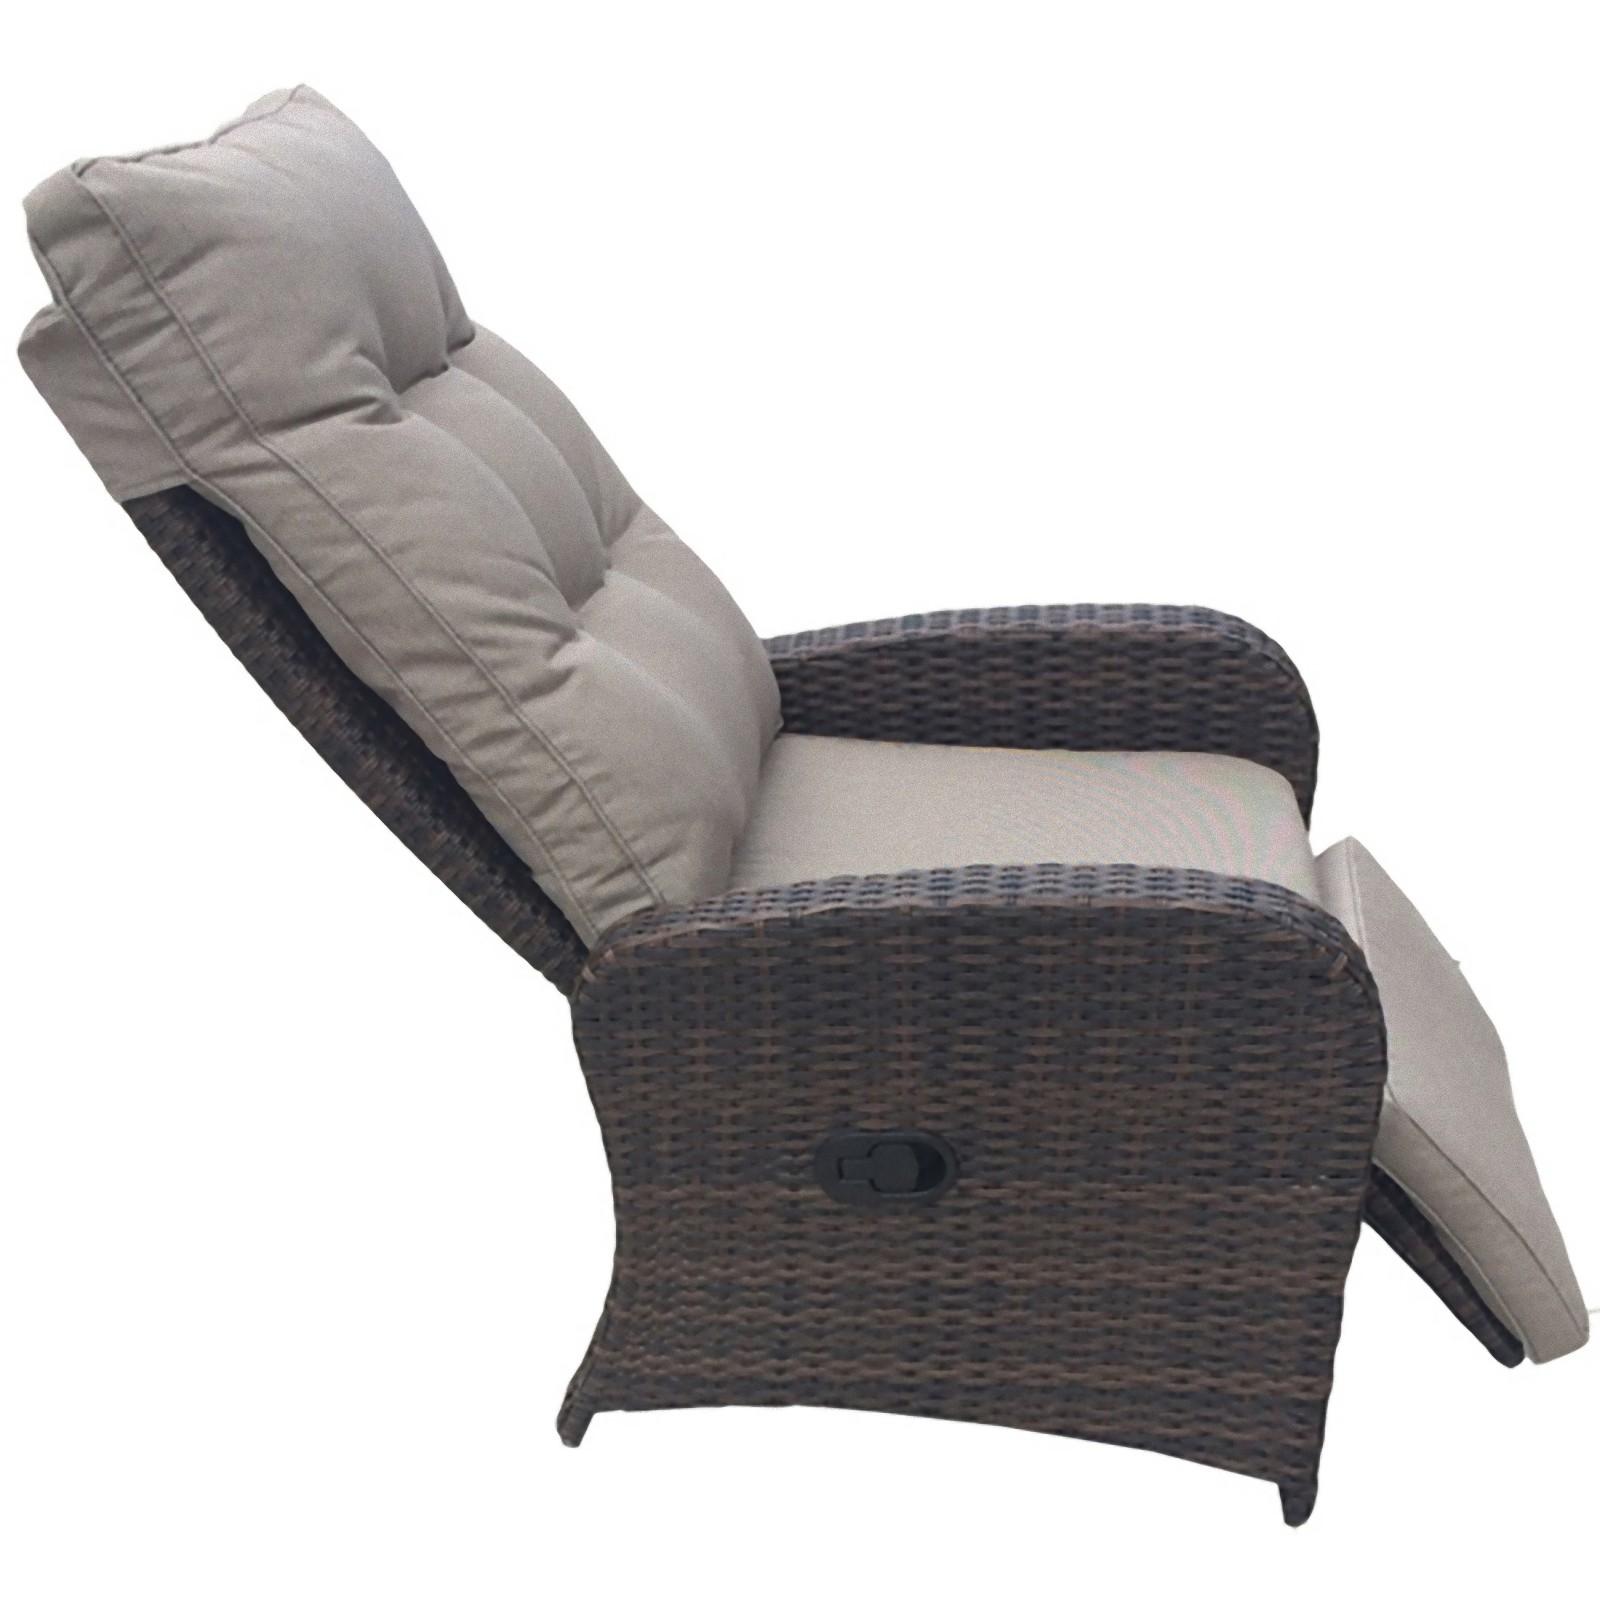 beco gartensessel rattan optik garten terrasse sessel. Black Bedroom Furniture Sets. Home Design Ideas